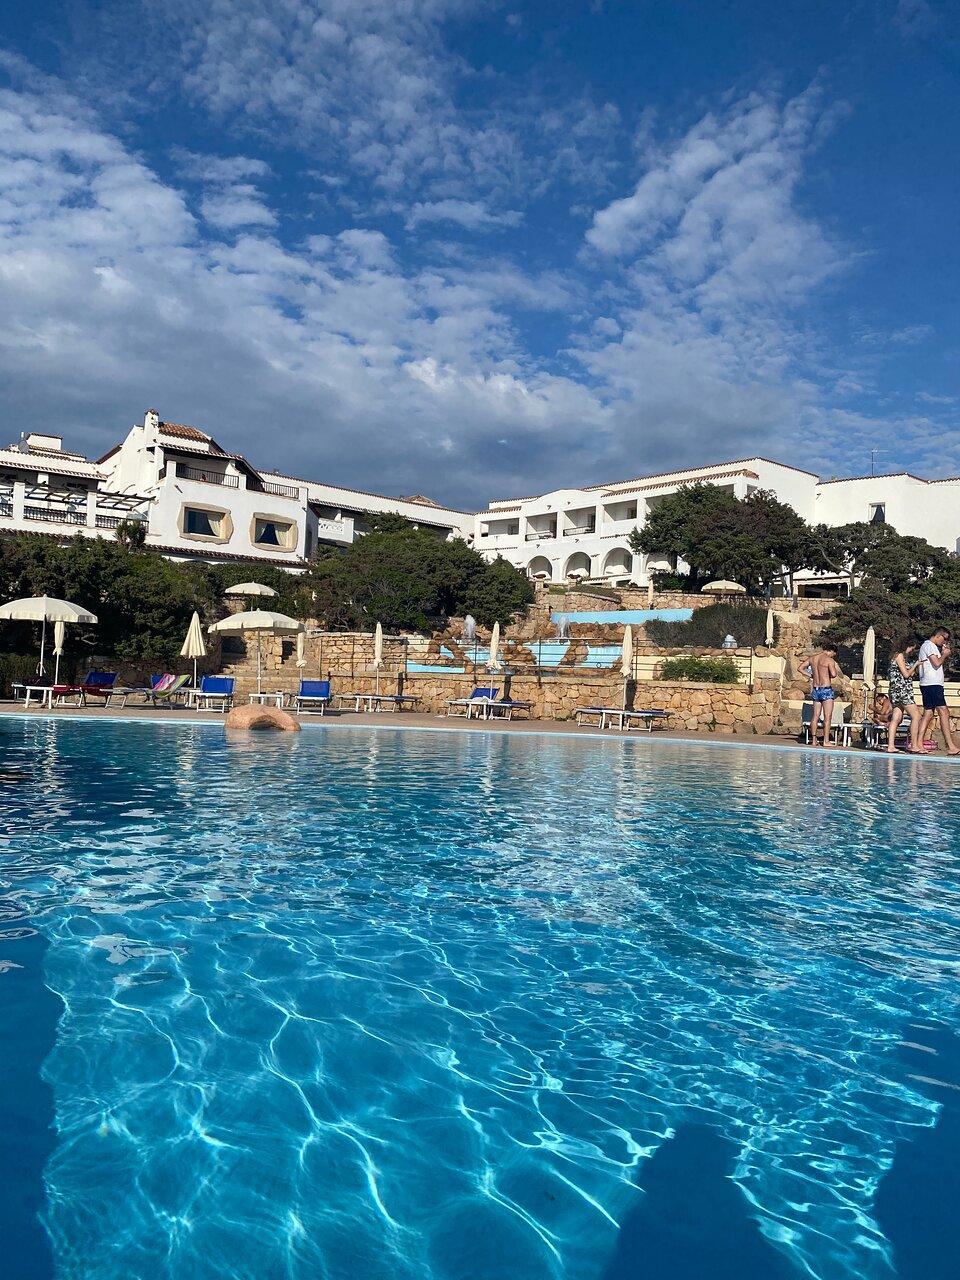 Colonna Grand Hotel Capo Testa 176 1 9 0 Prices Reviews Santa Teresa Gallura Italy Tripadvisor